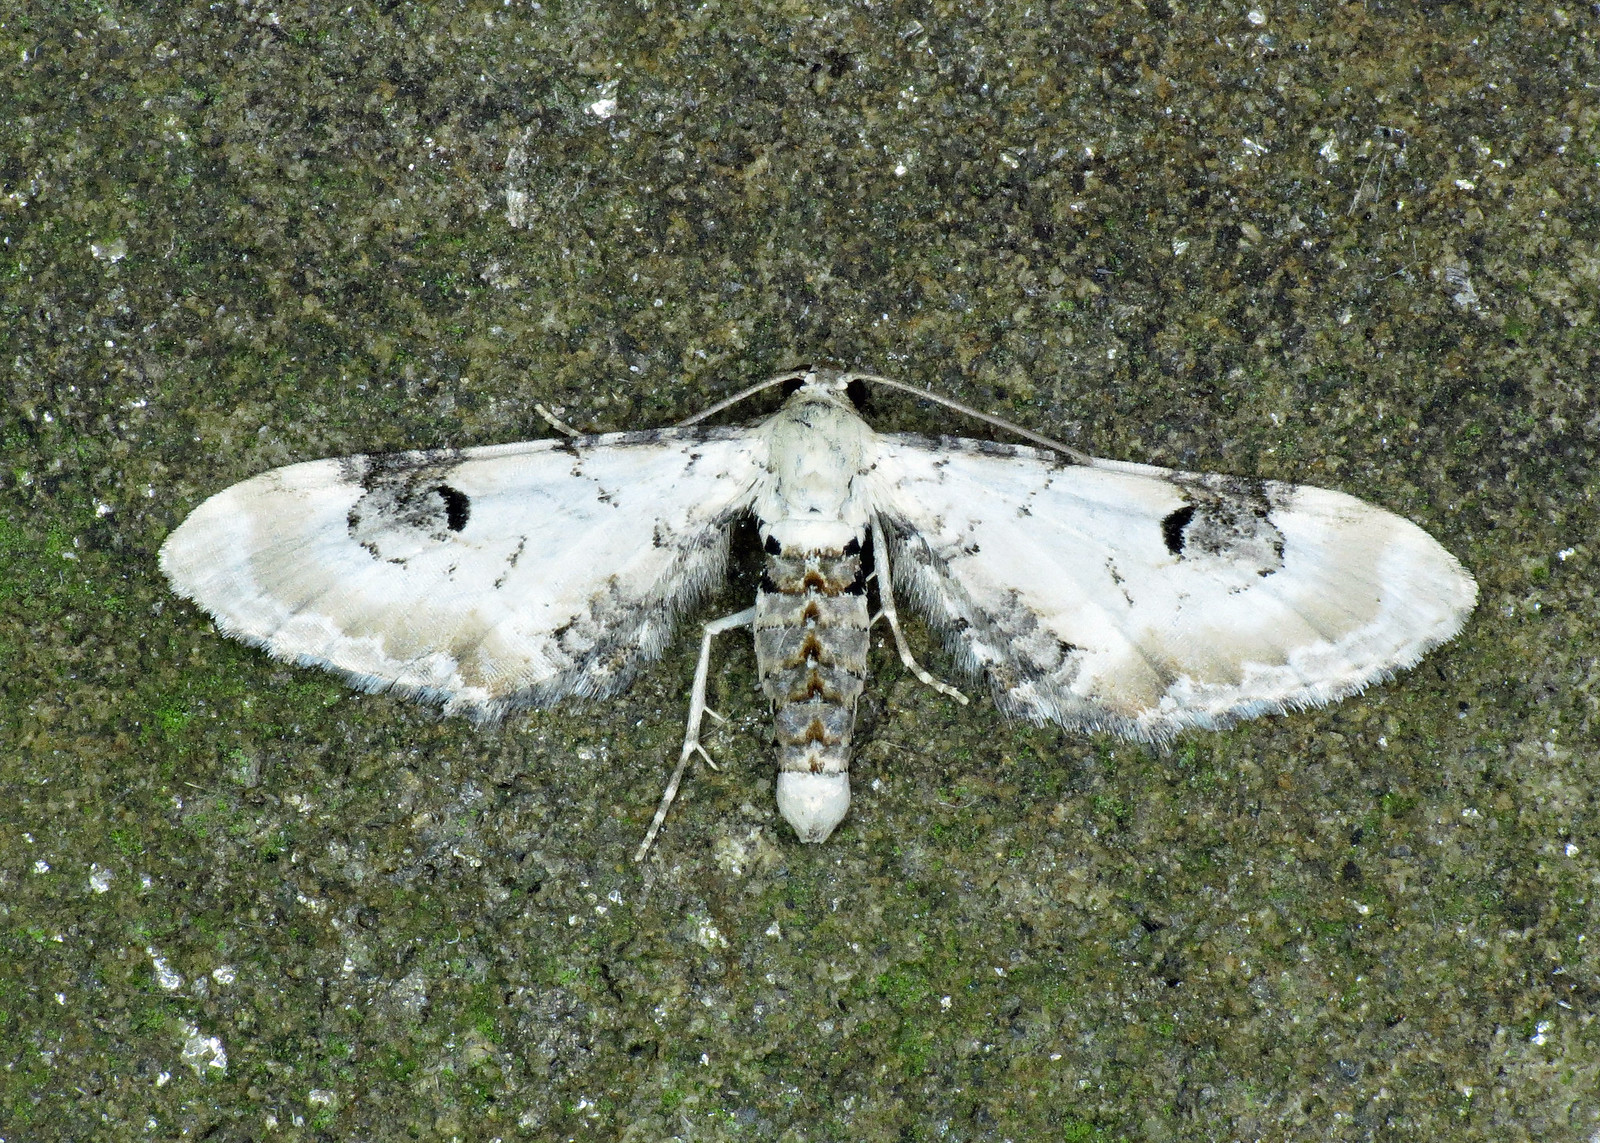 1825 Lime-speck Pug - Eupithecia centaureata